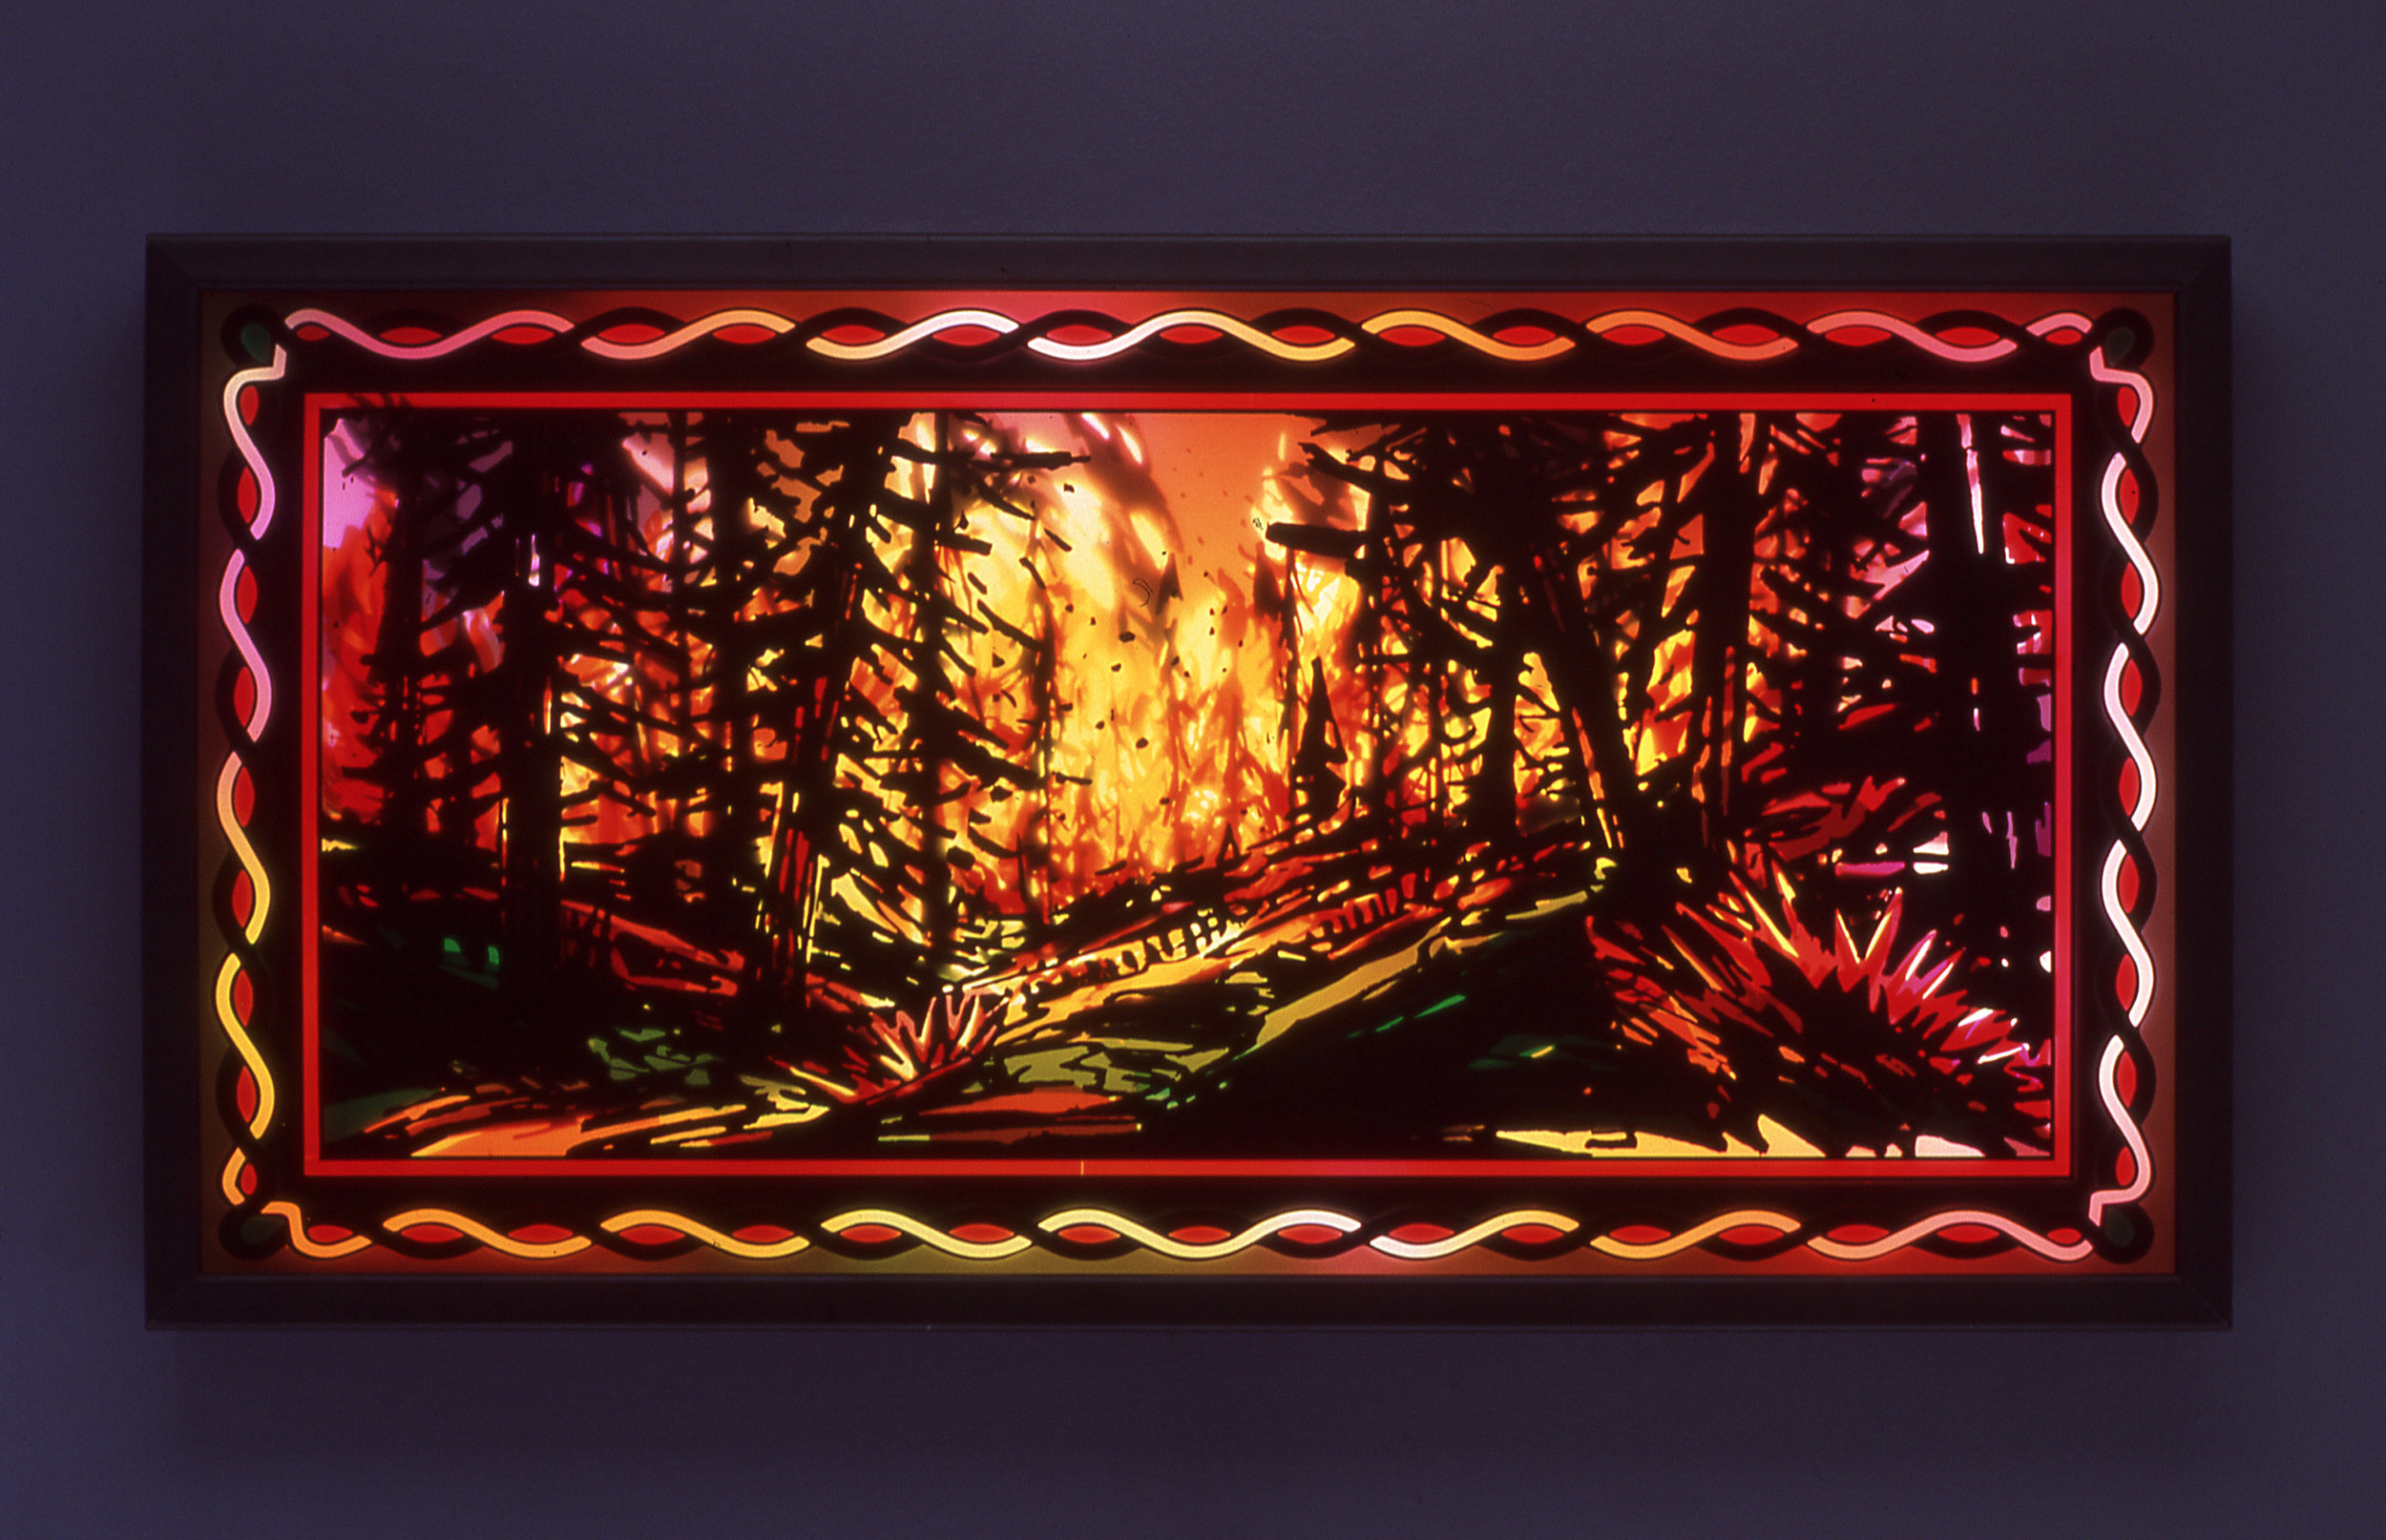 "Fire Box # 1, 2003  Transparent vinyl on plexi-glass, metal framed light-box  26"" x 50"" x 3 3/4"""